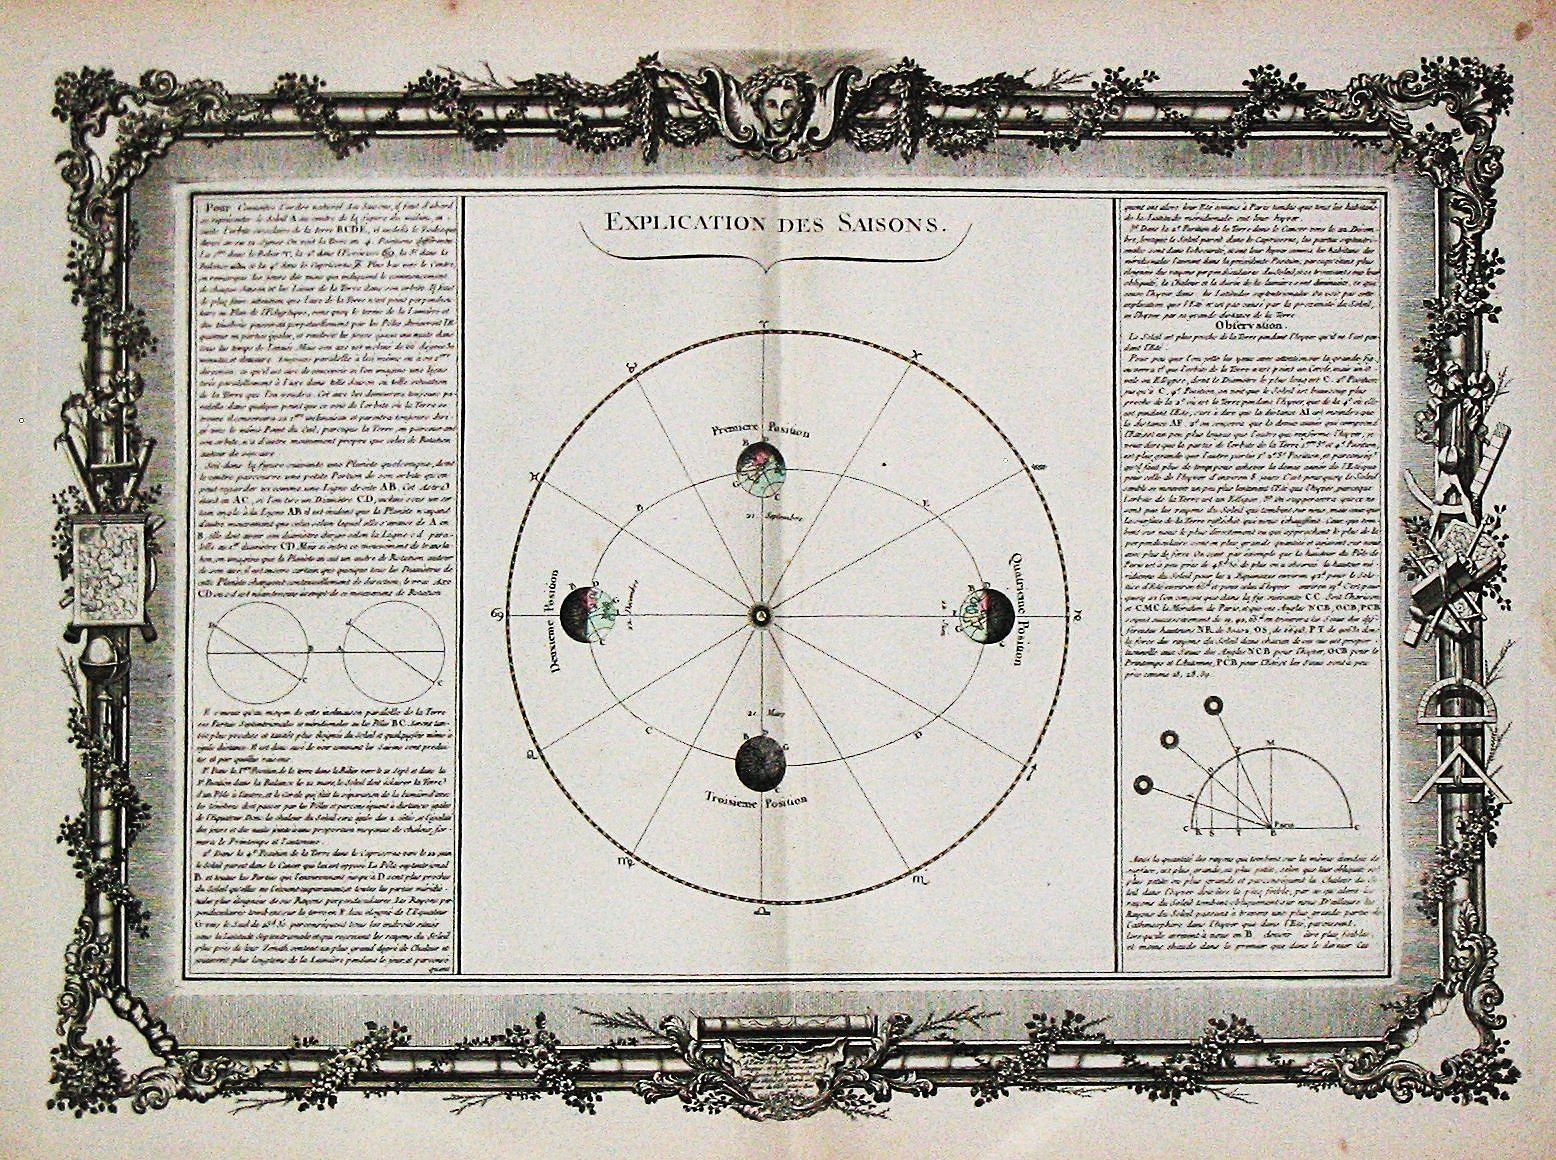 BUY DE MORNAS, C. - Explication de Saisons. Antique celestial chart depicting the eclips of the sun and the moon.